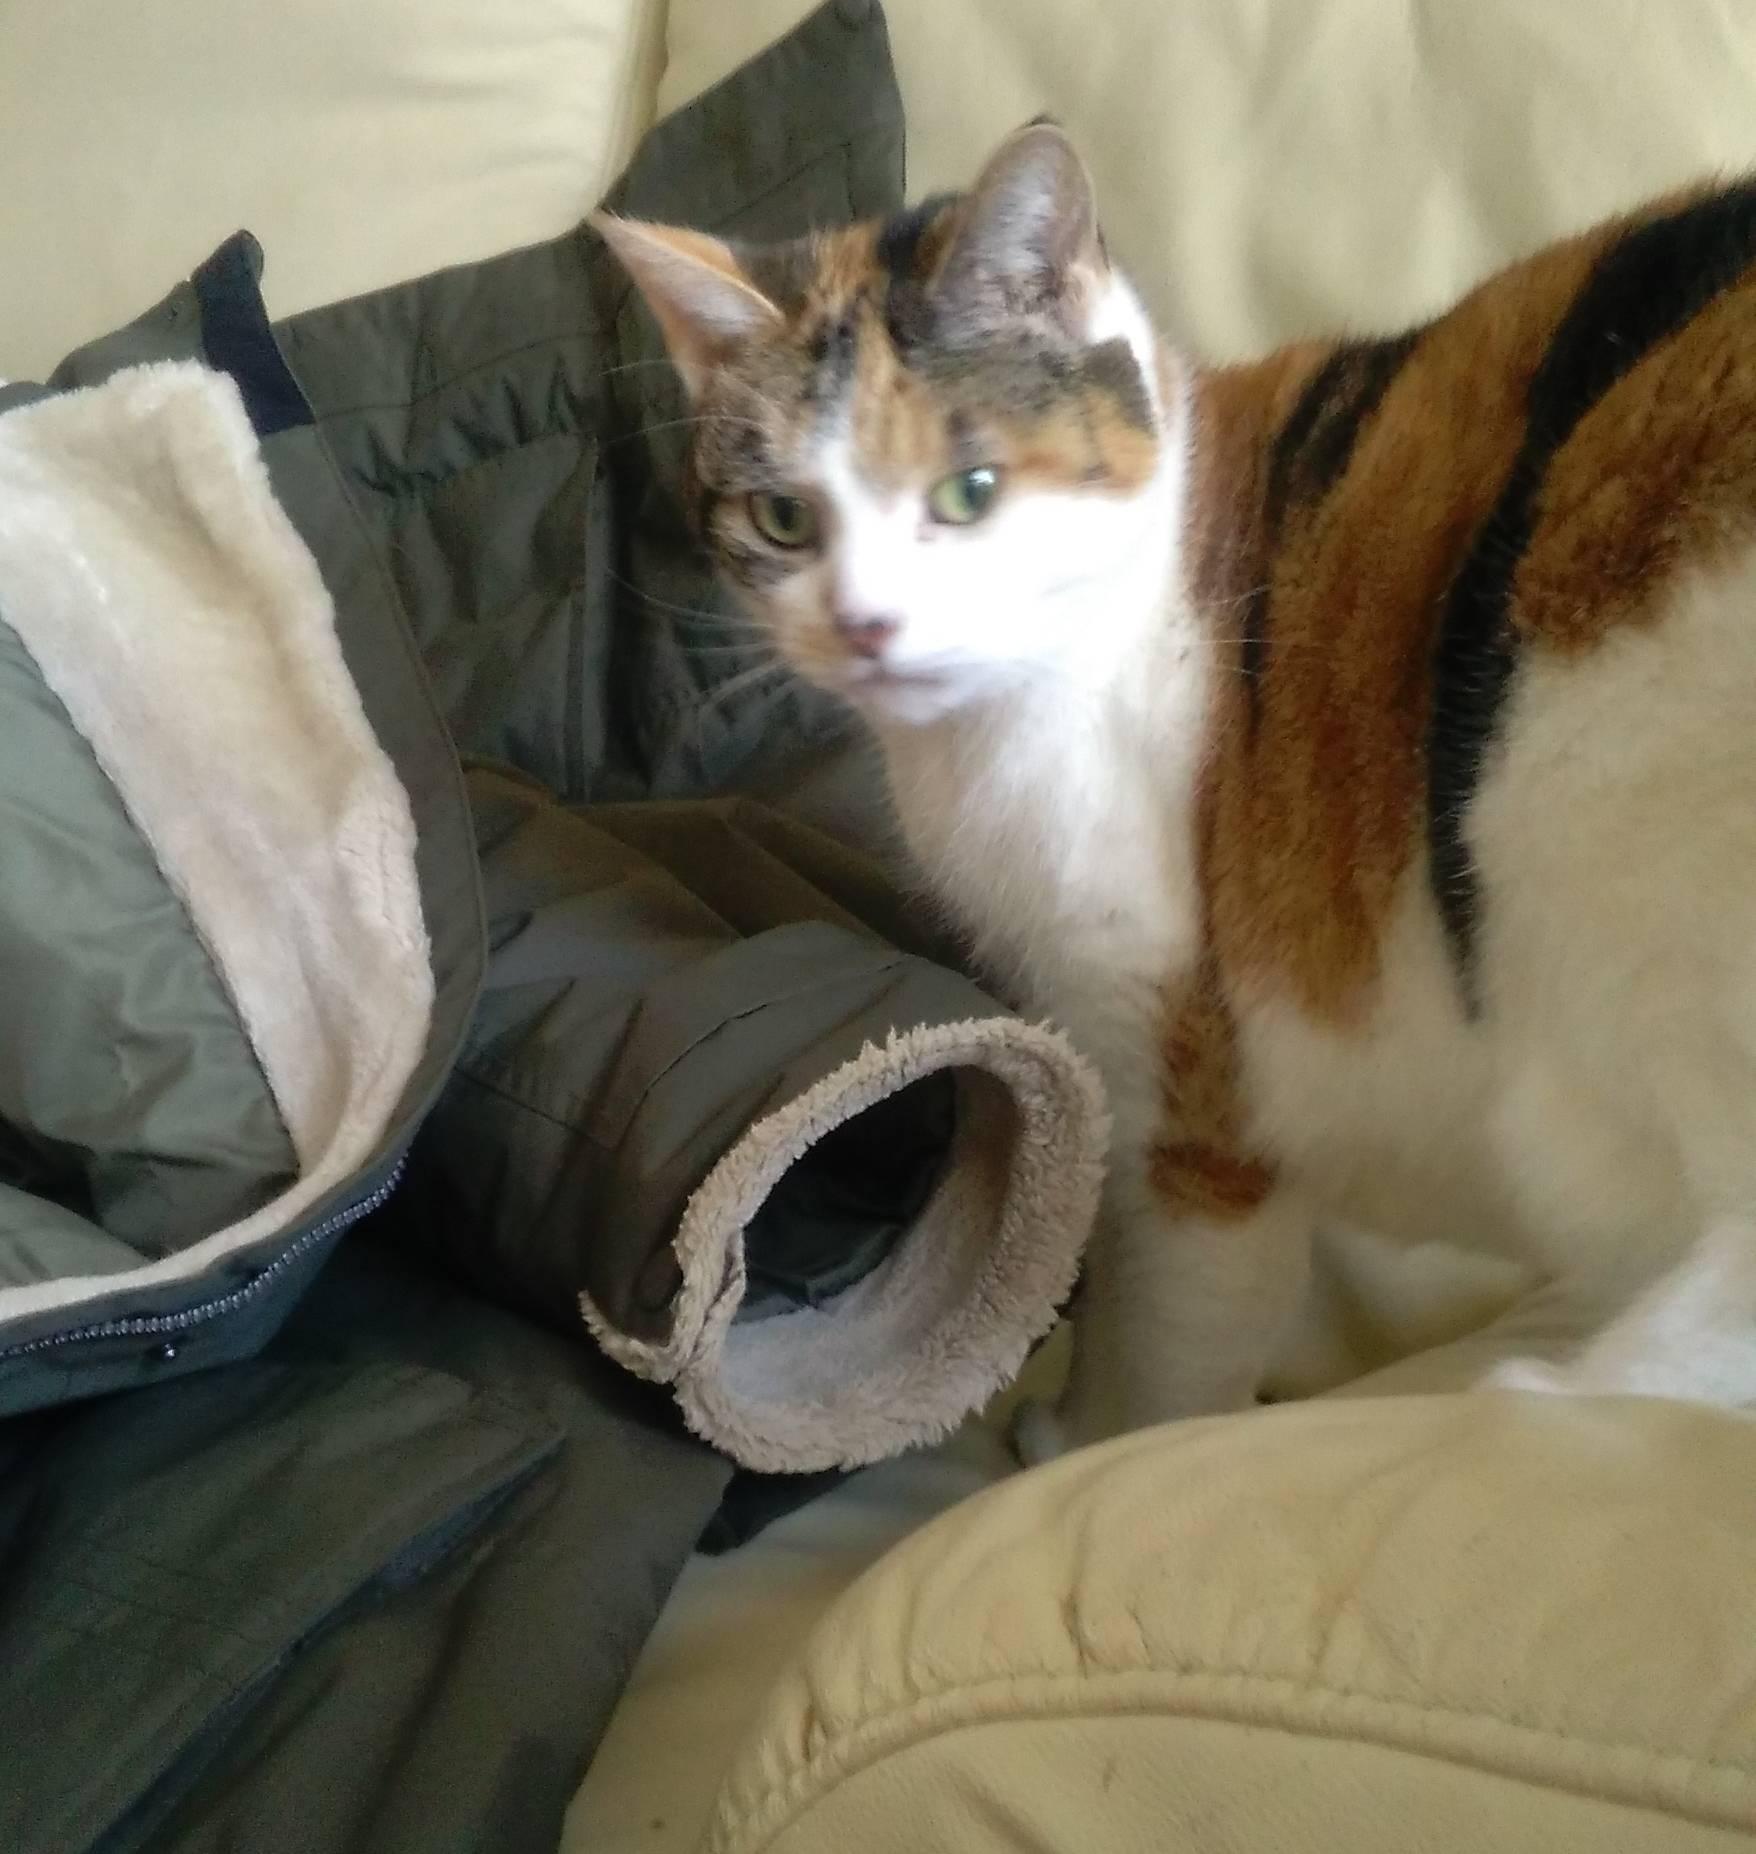 Caught sniffing Sarah's coat